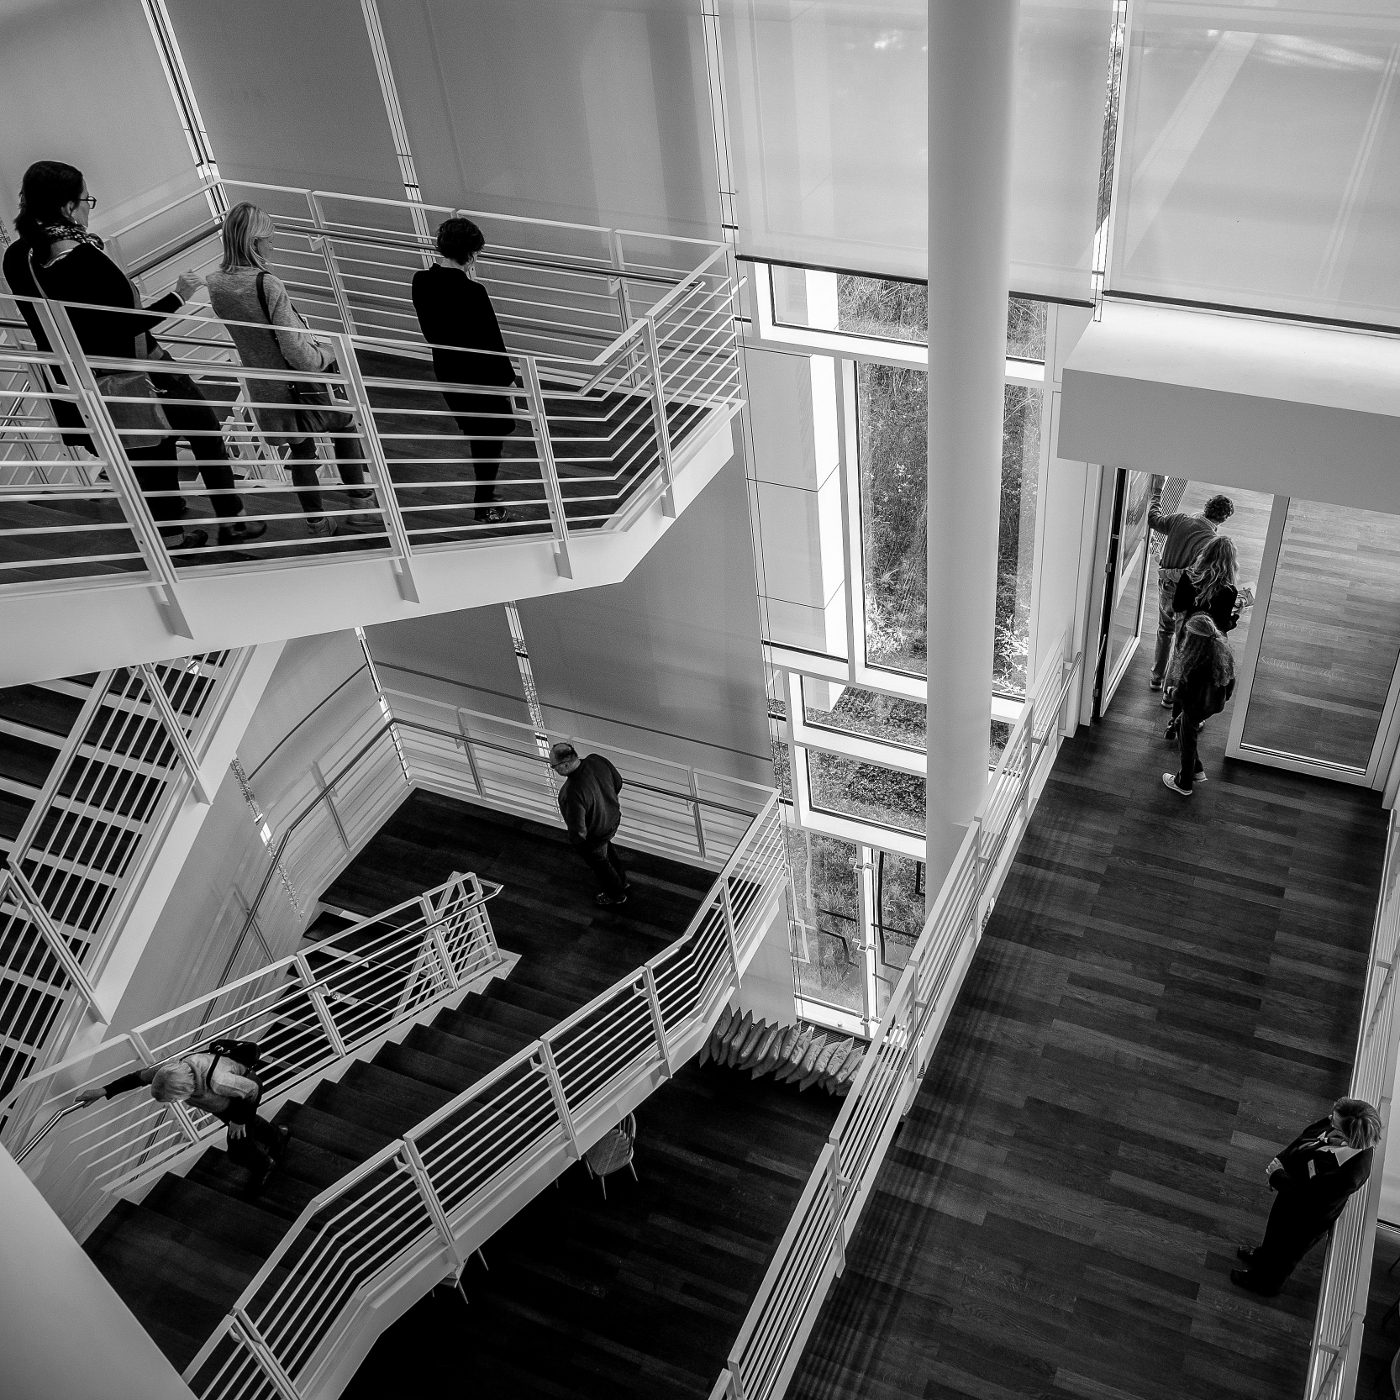 Arp Museum | Trepp auf, Trepp ab  | © wolfgang röser | worobo